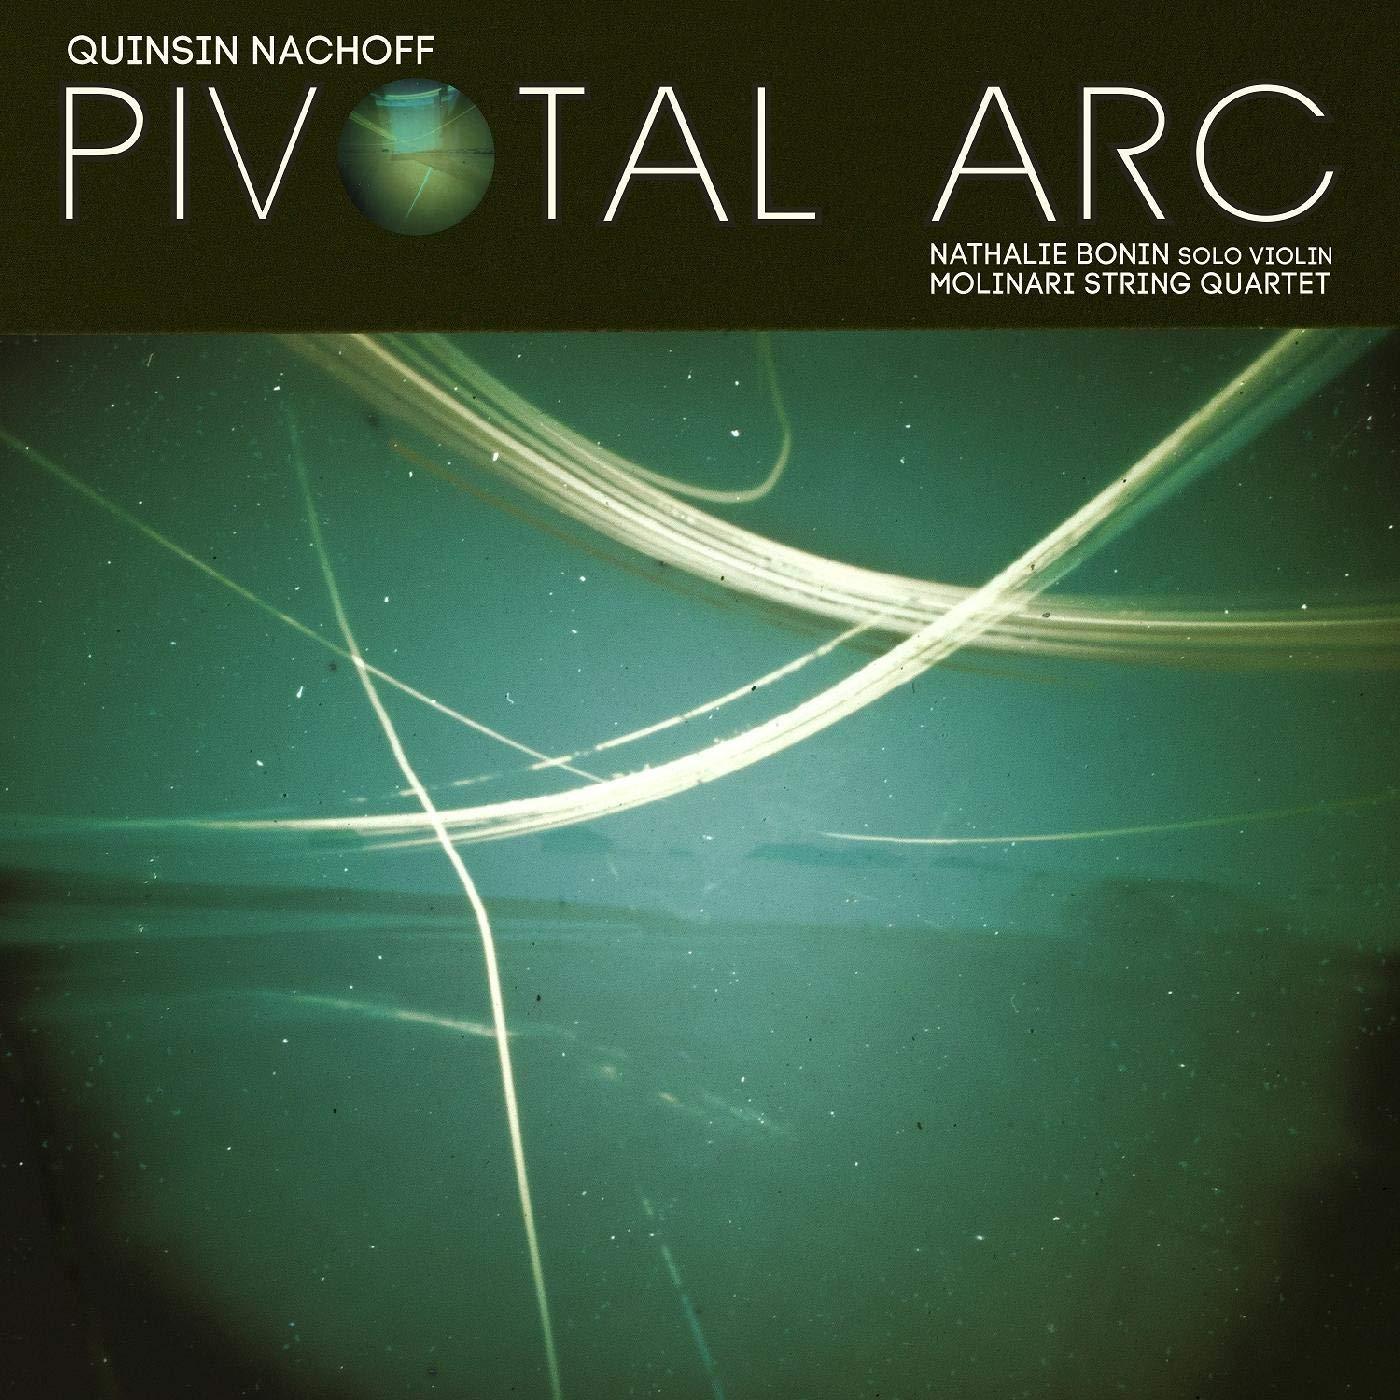 QUINSIN NACHOFF - Pivotal Arc cover